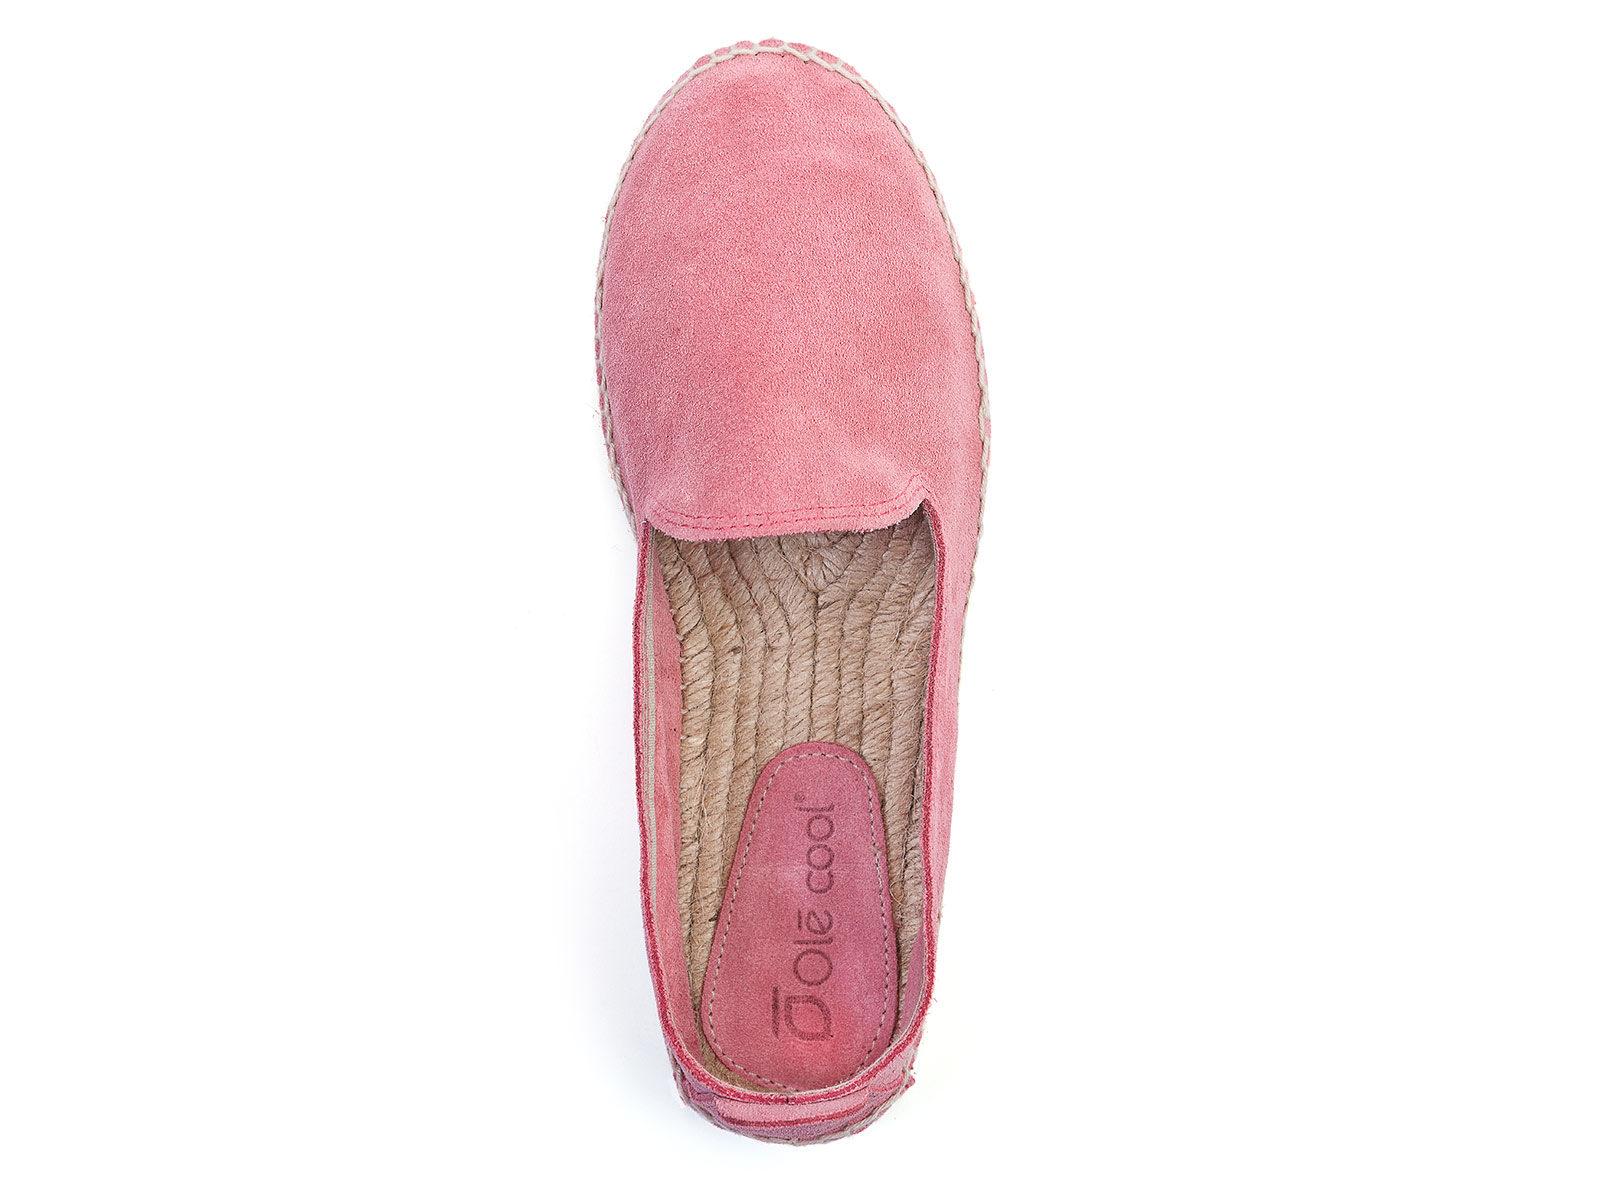 Alpargatas planas de mujer OLĒ COOL de serraje rosa